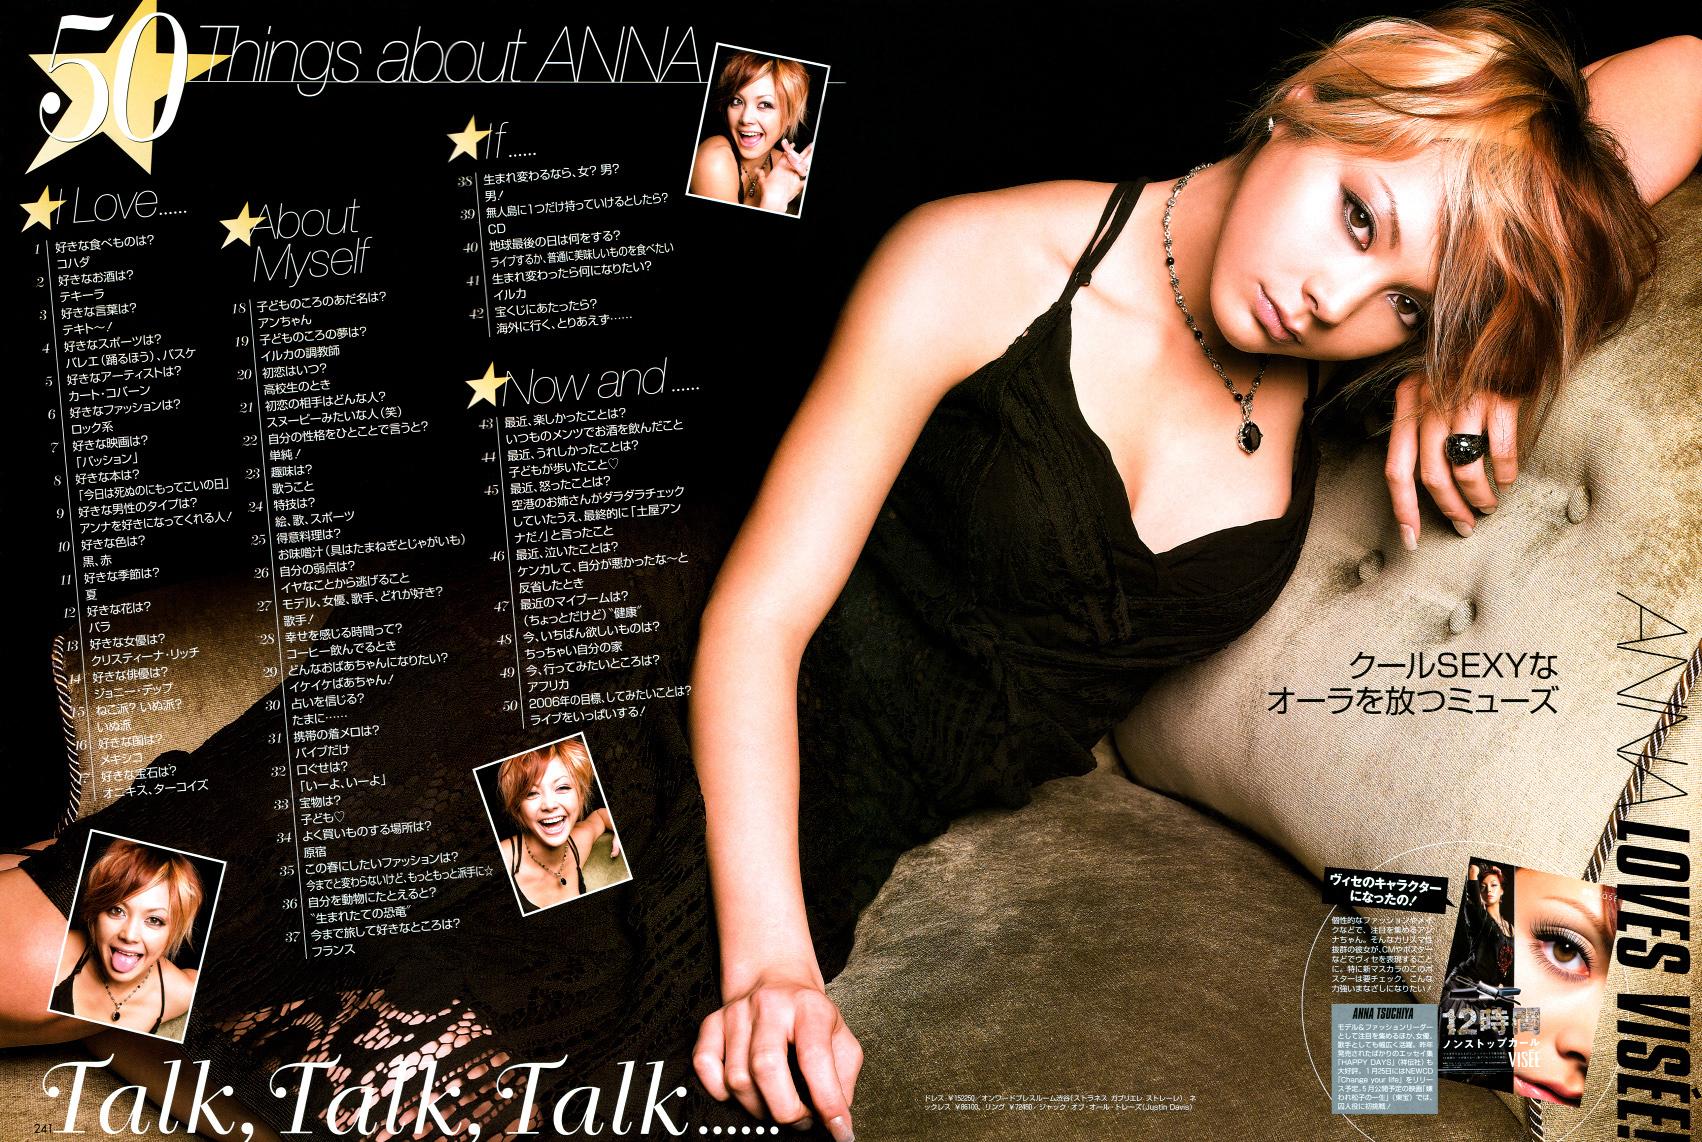 [Image: Minitokyo.Anna.Tsuchiya.512033.jpg]